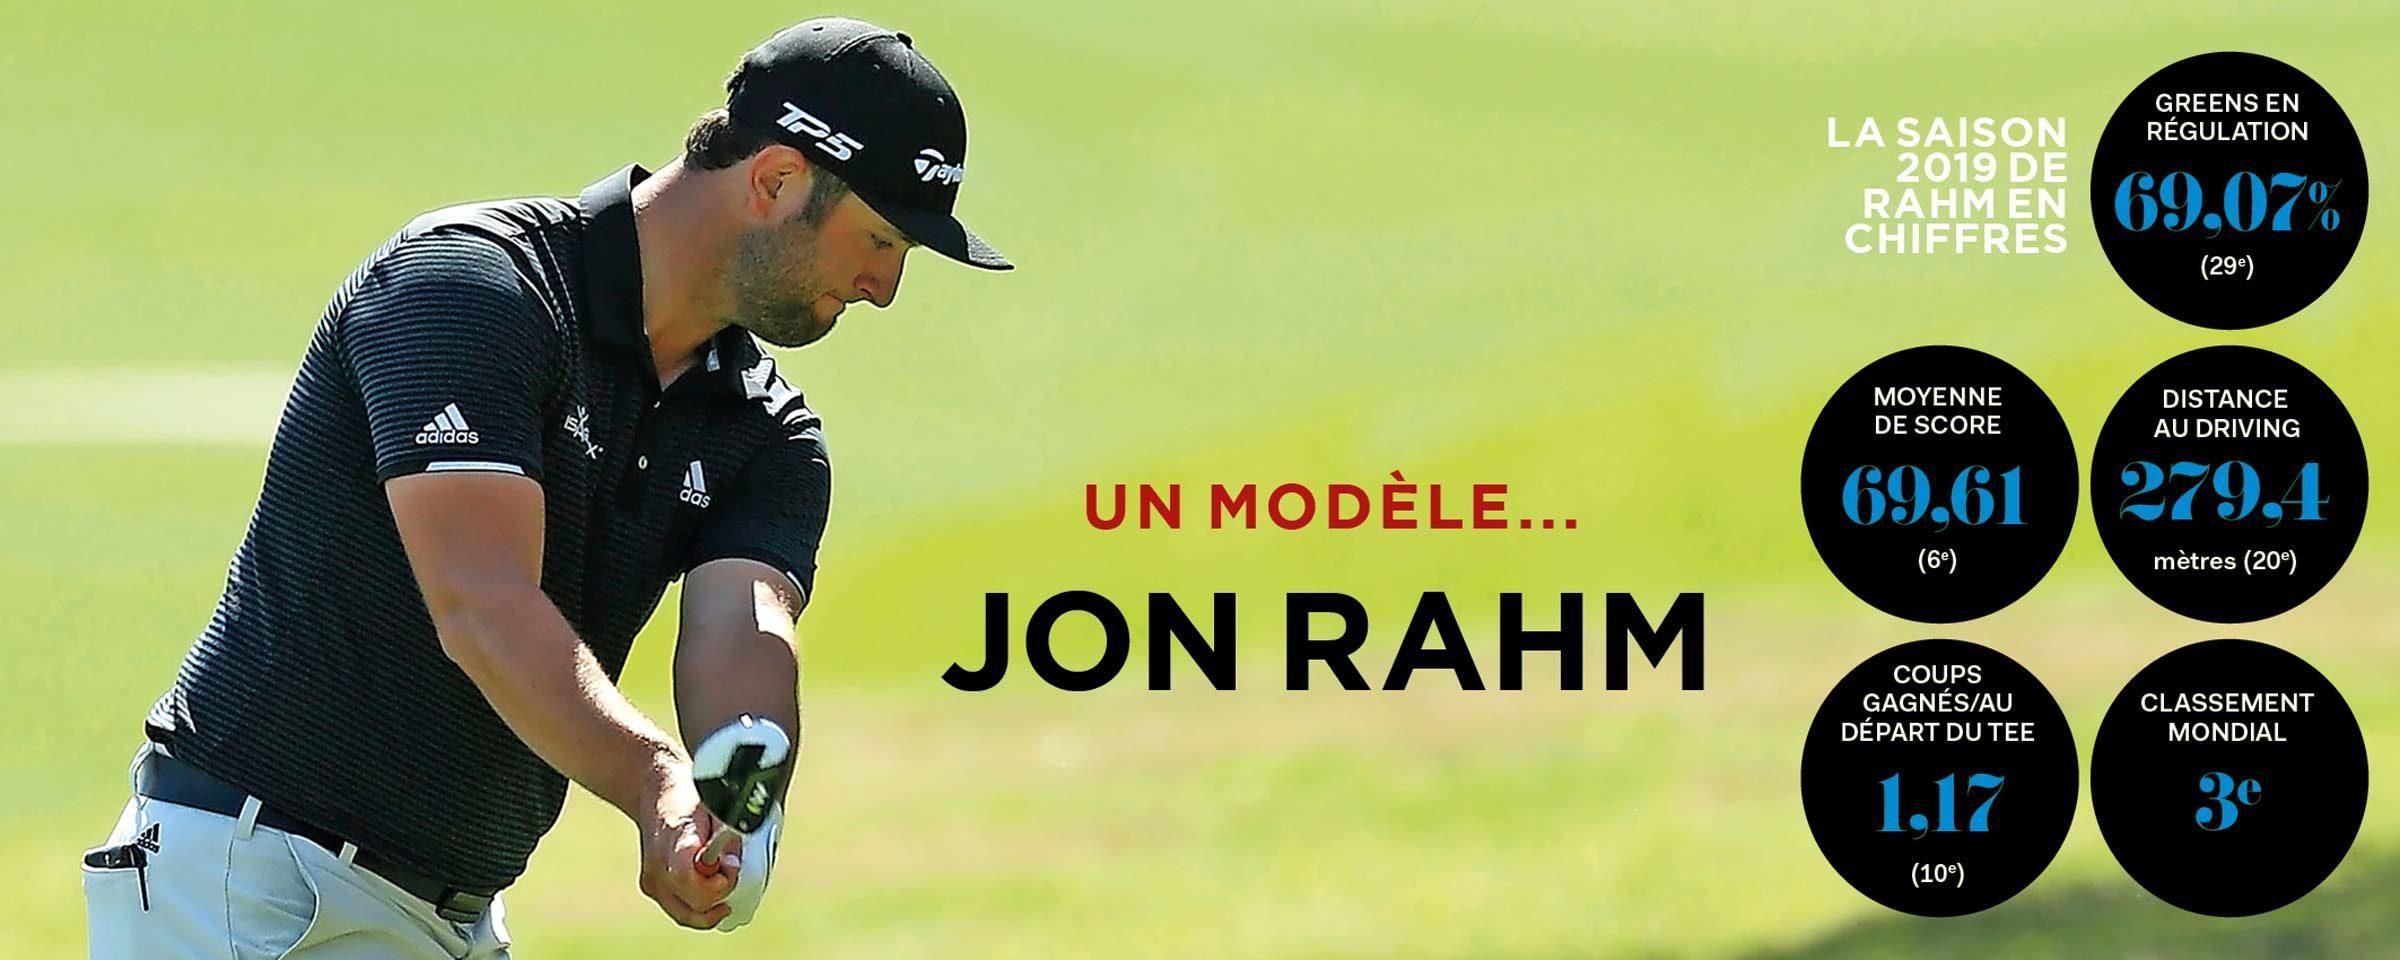 Un modèle… Jon Rahm